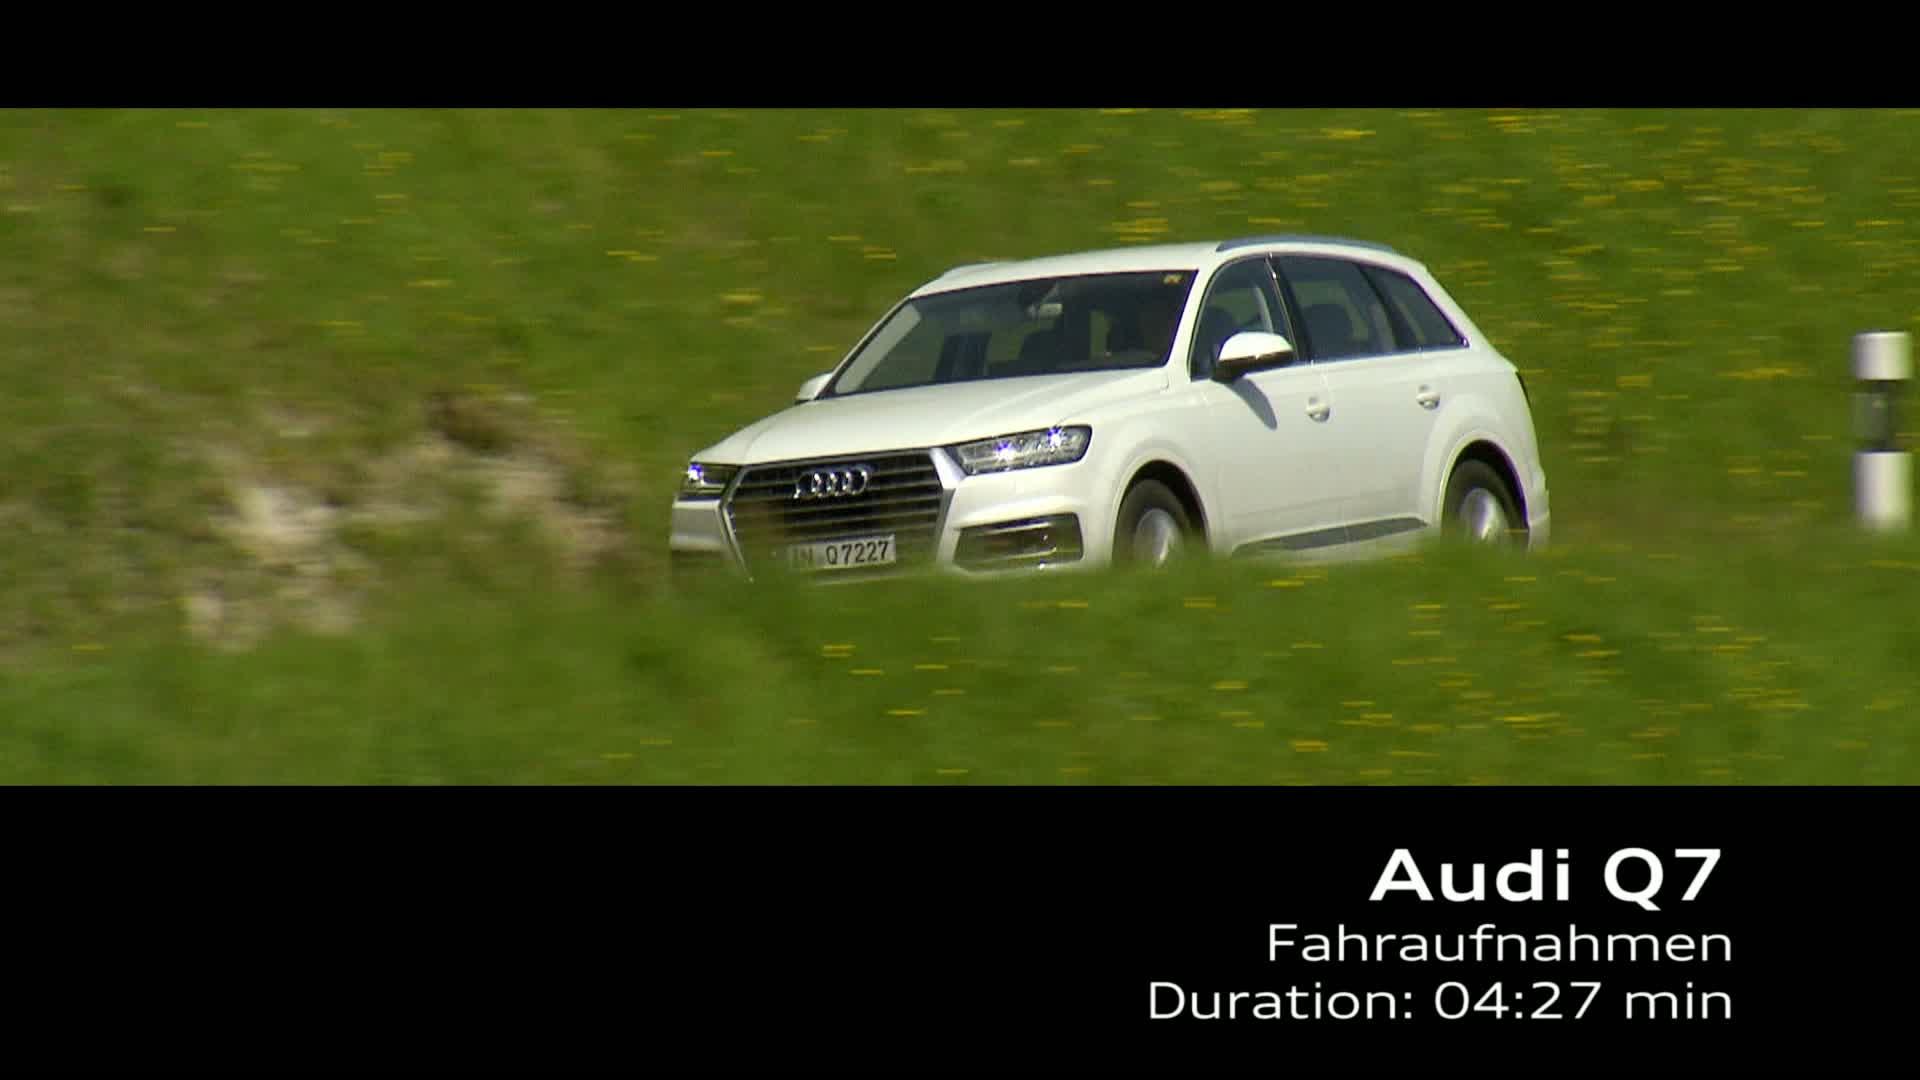 Audi Q7 Fahraufnahmen- Footage